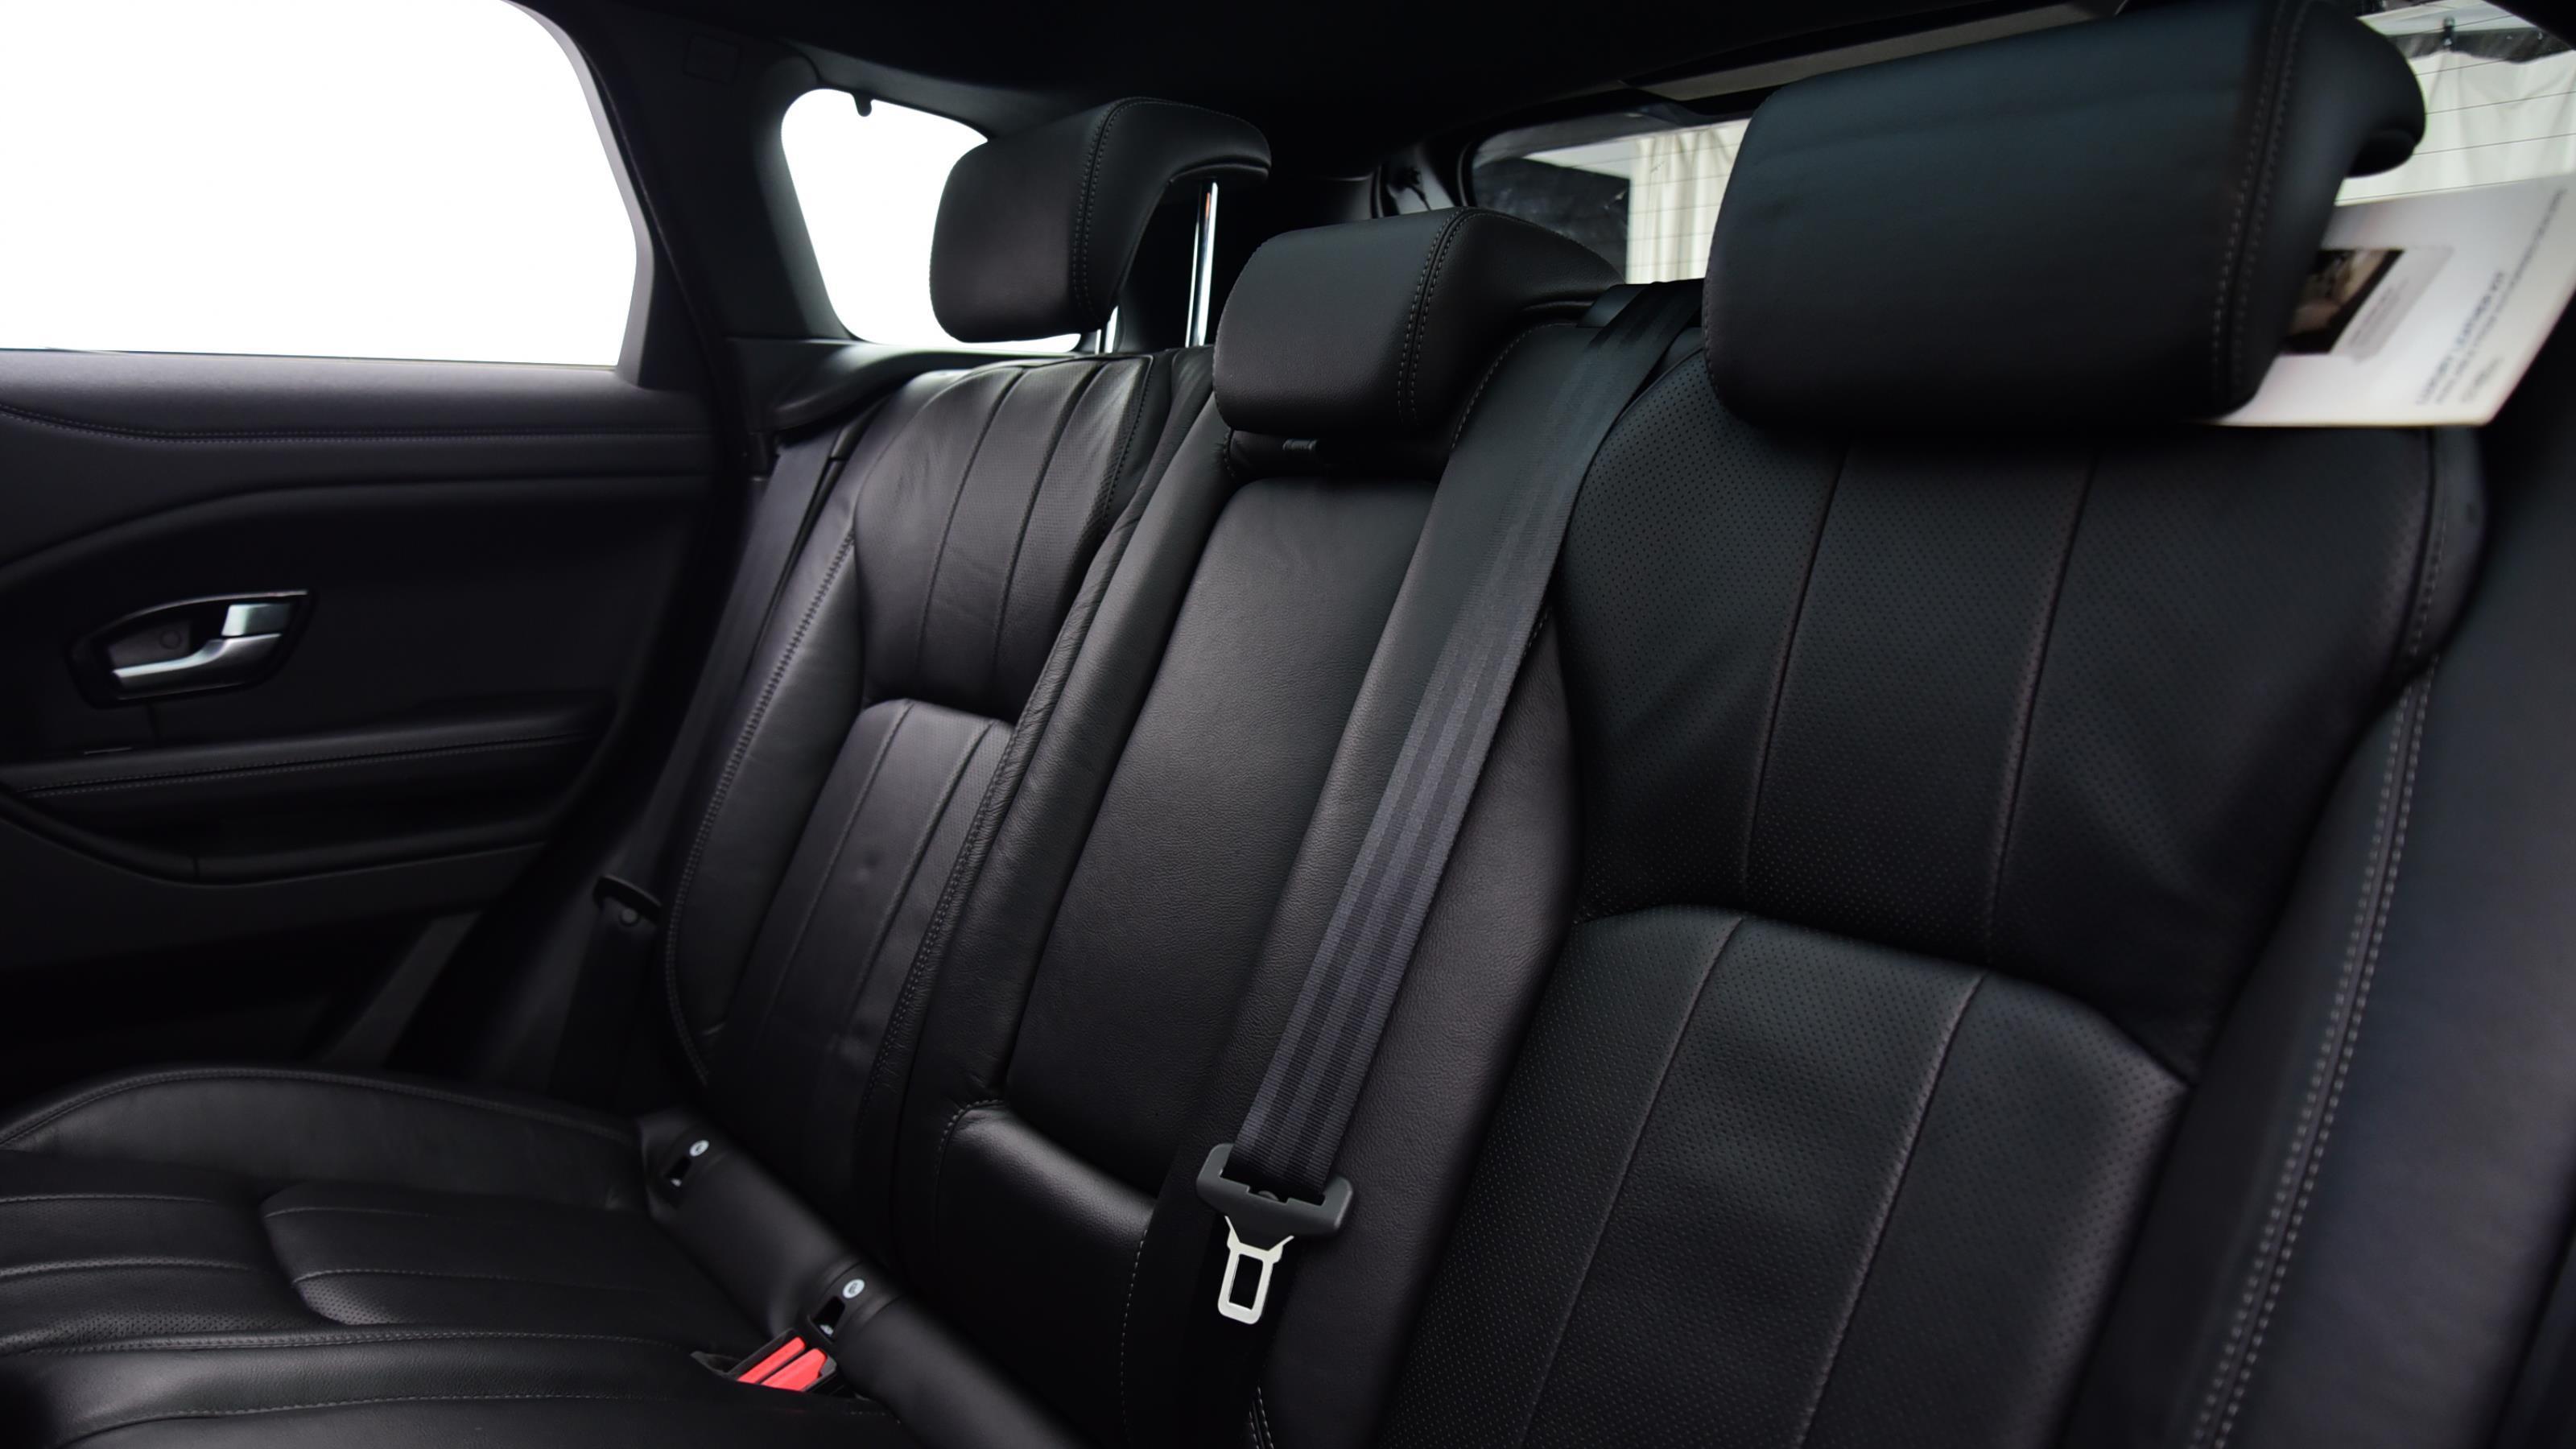 Used 2017 Land Rover RANGE ROVER EVOQUE 2.0 TD4 SE Tech 5dr Auto BLUE at Saxton4x4